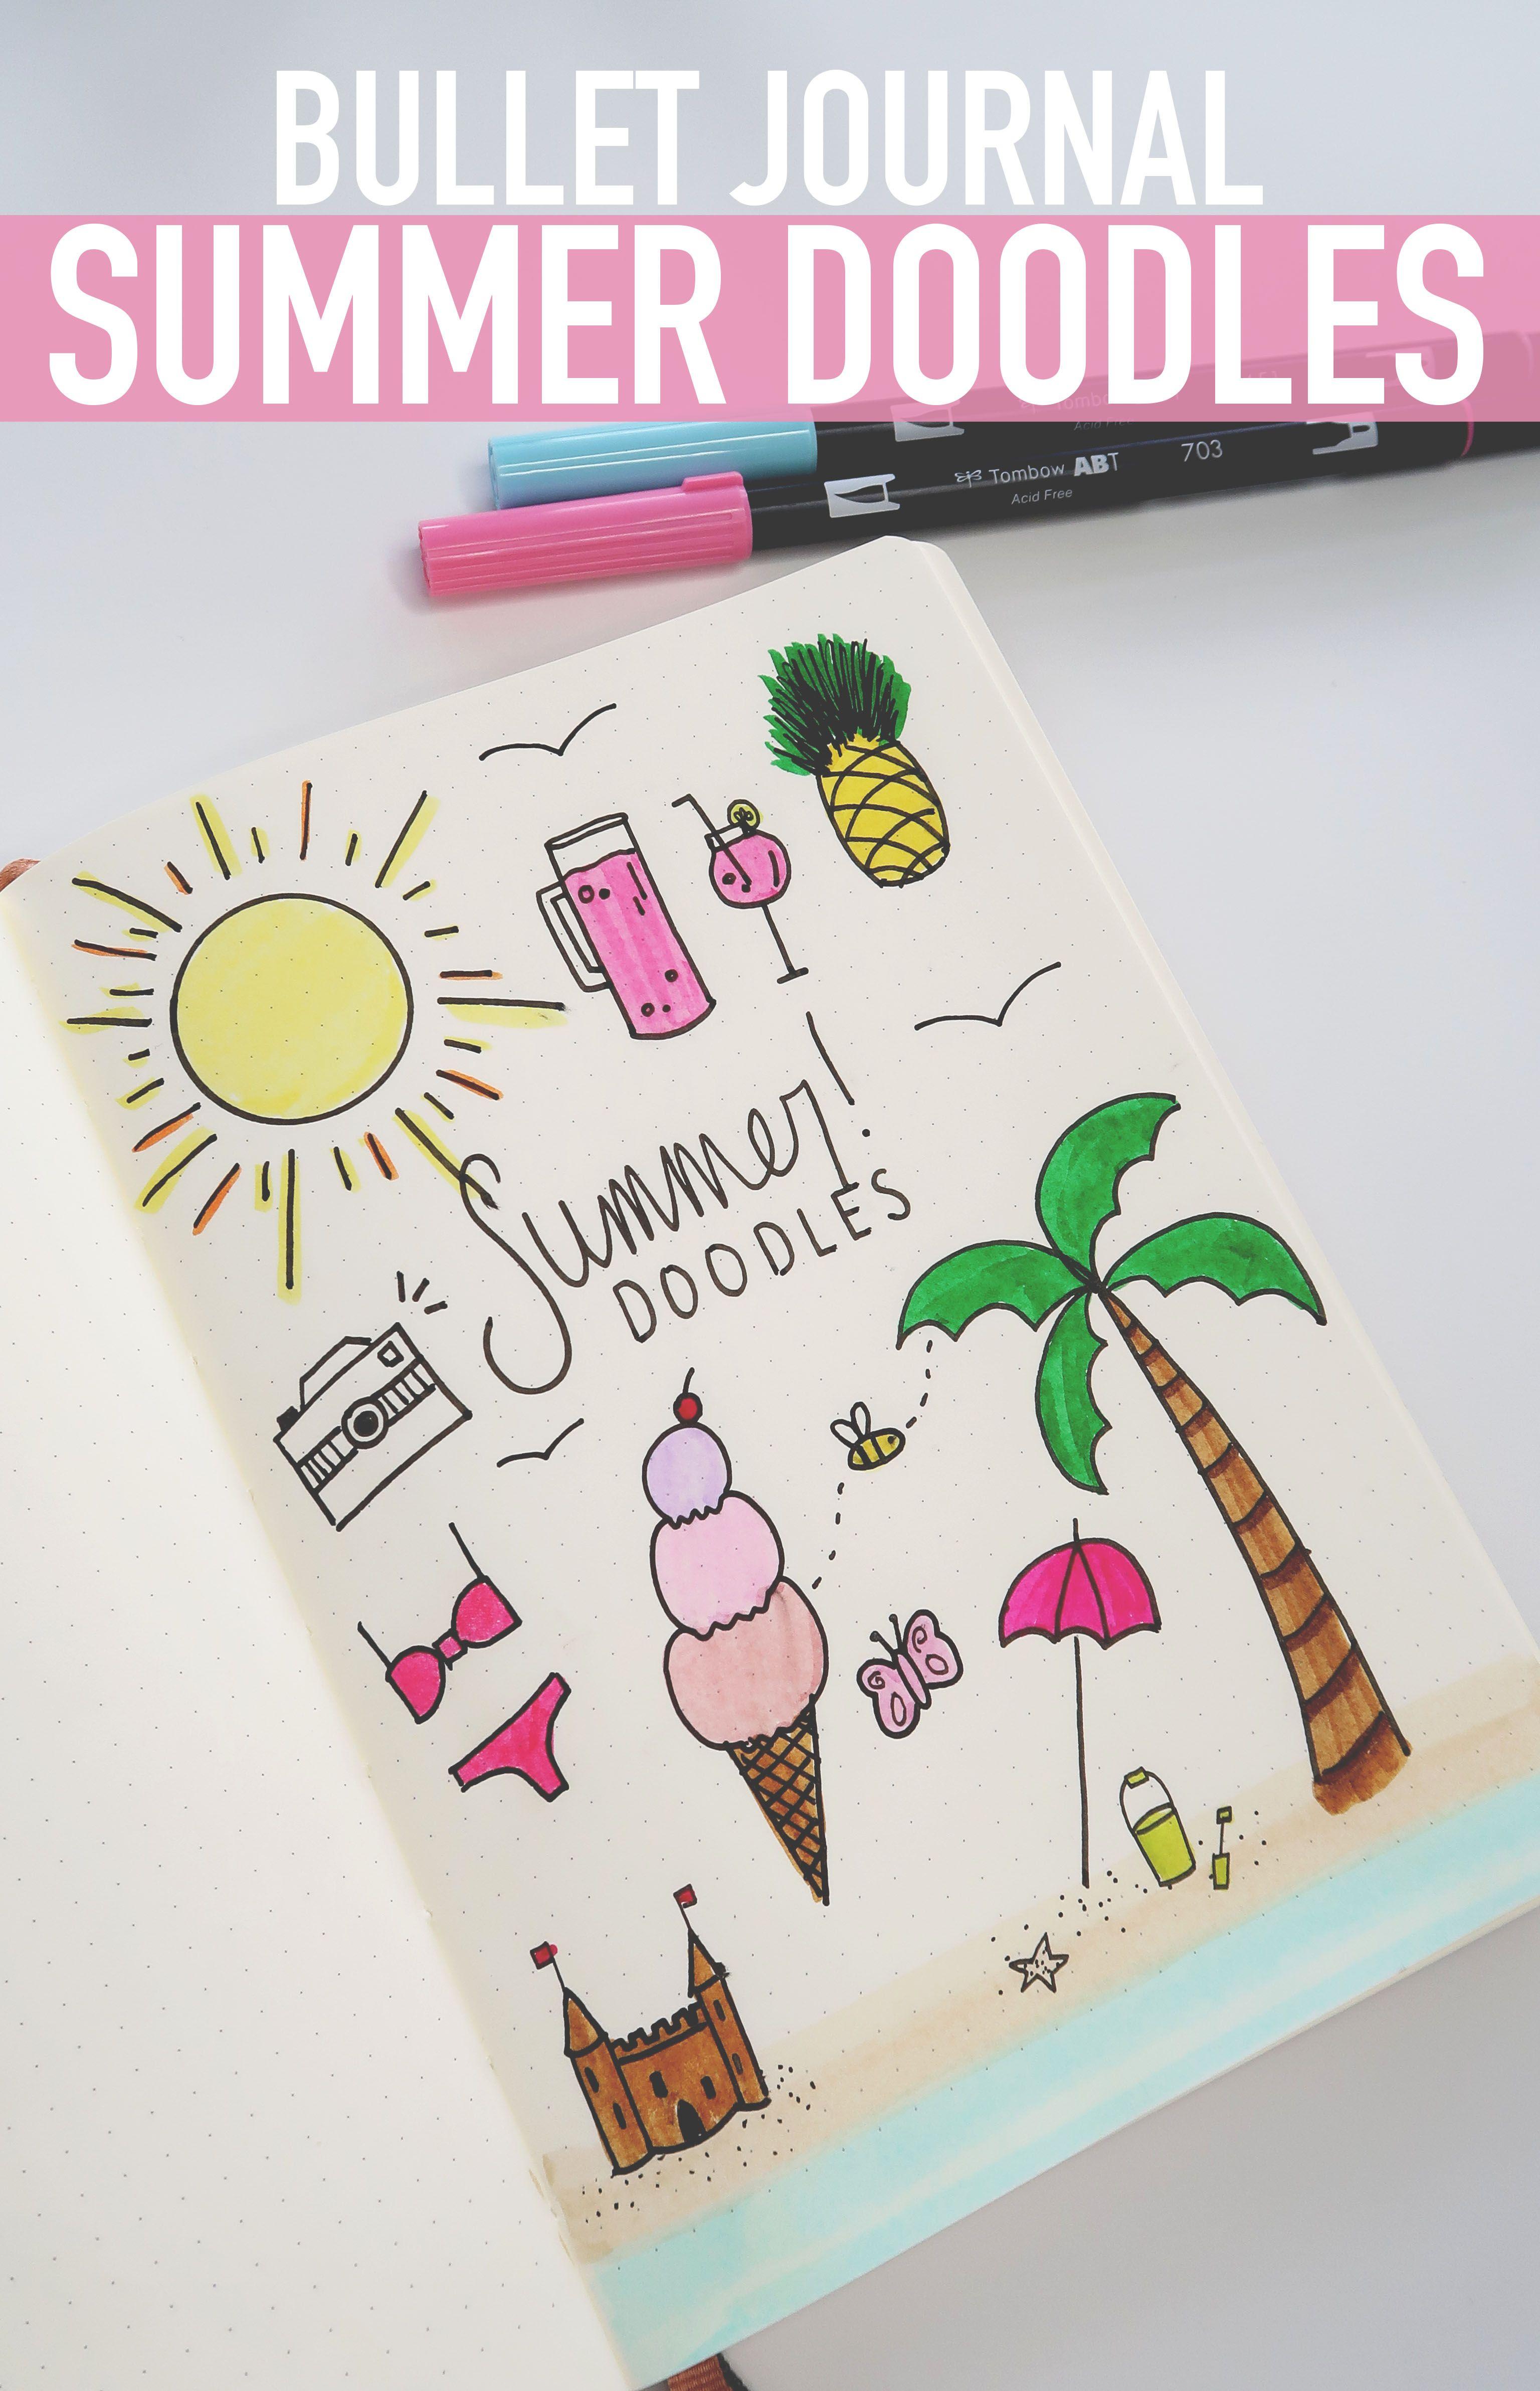 Bullet Journal Summer Doodles How To Doodle Tutorial